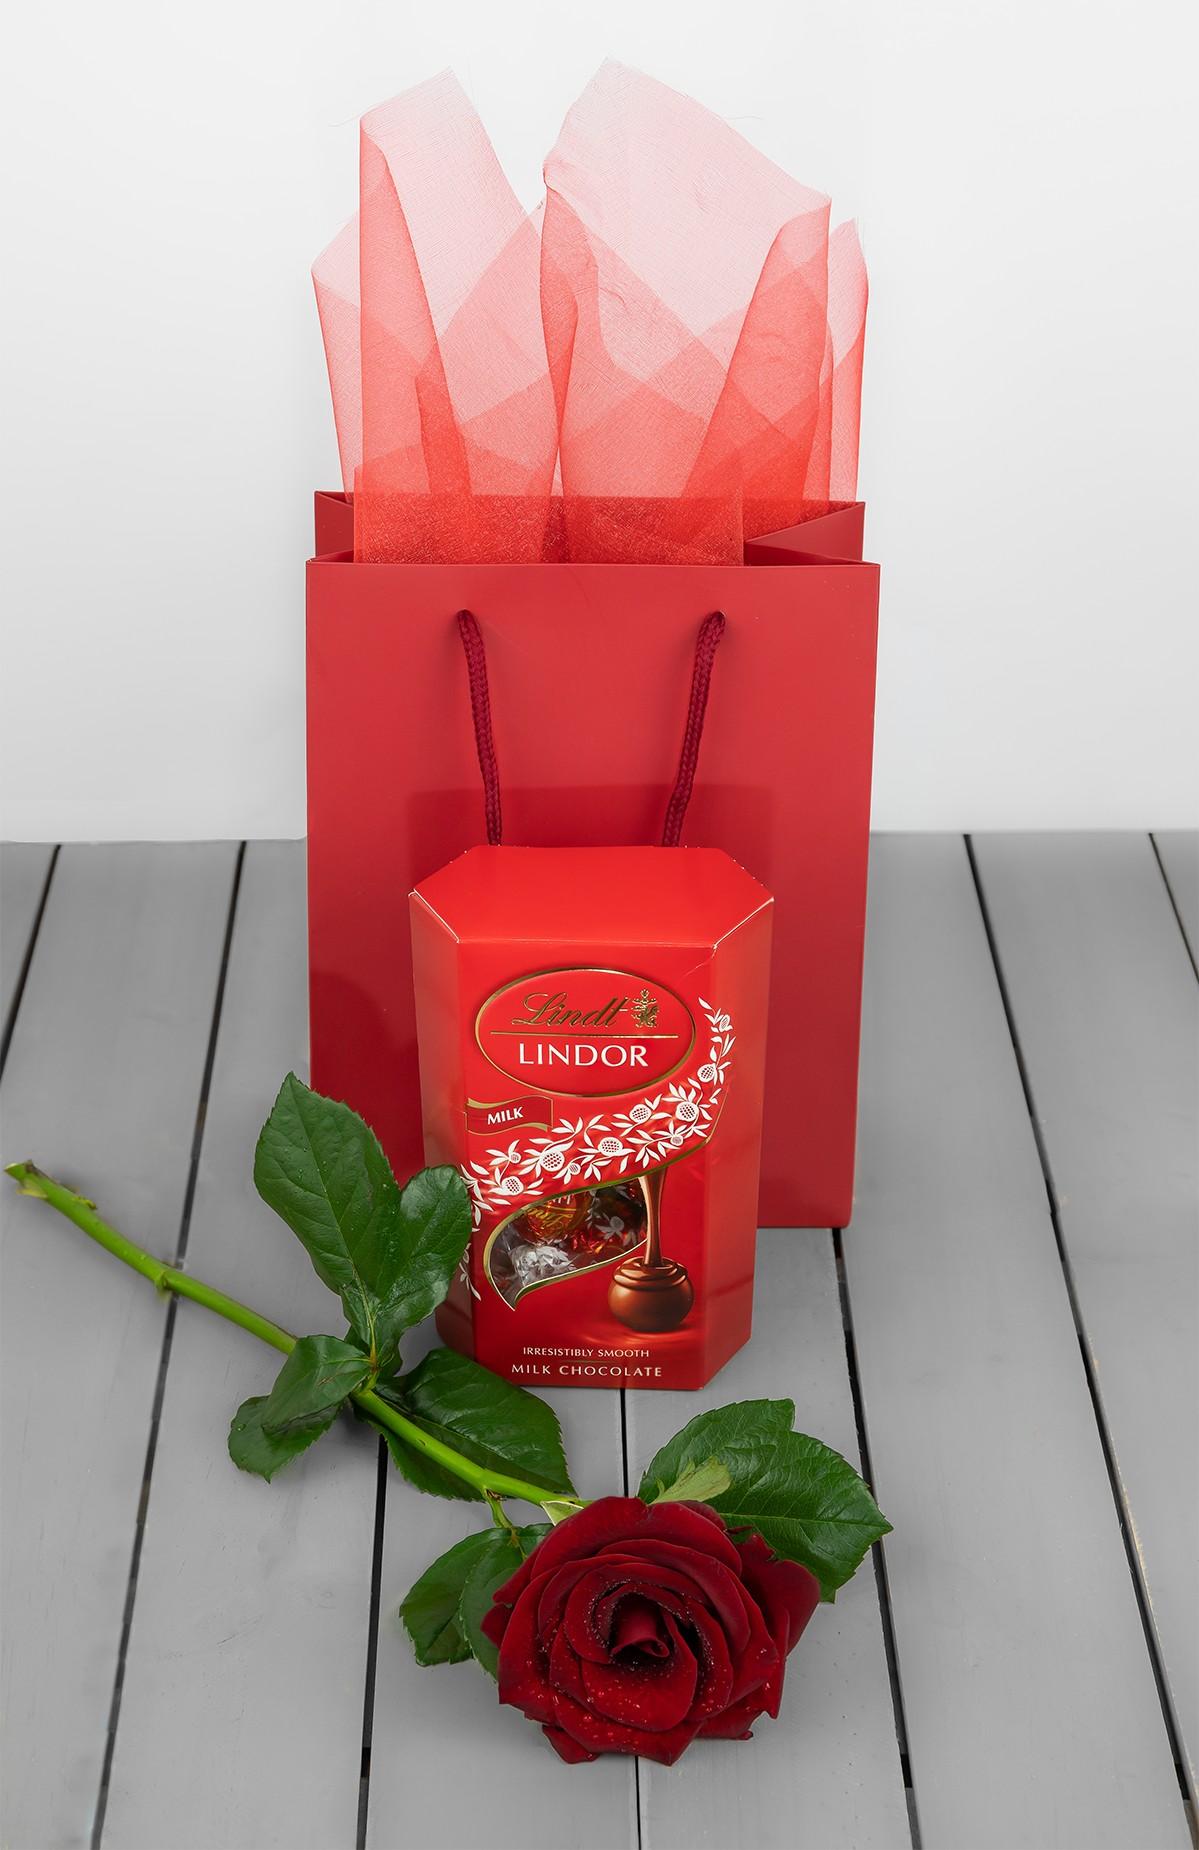 Lindor Chocolate And Gift Bag Plus Rose